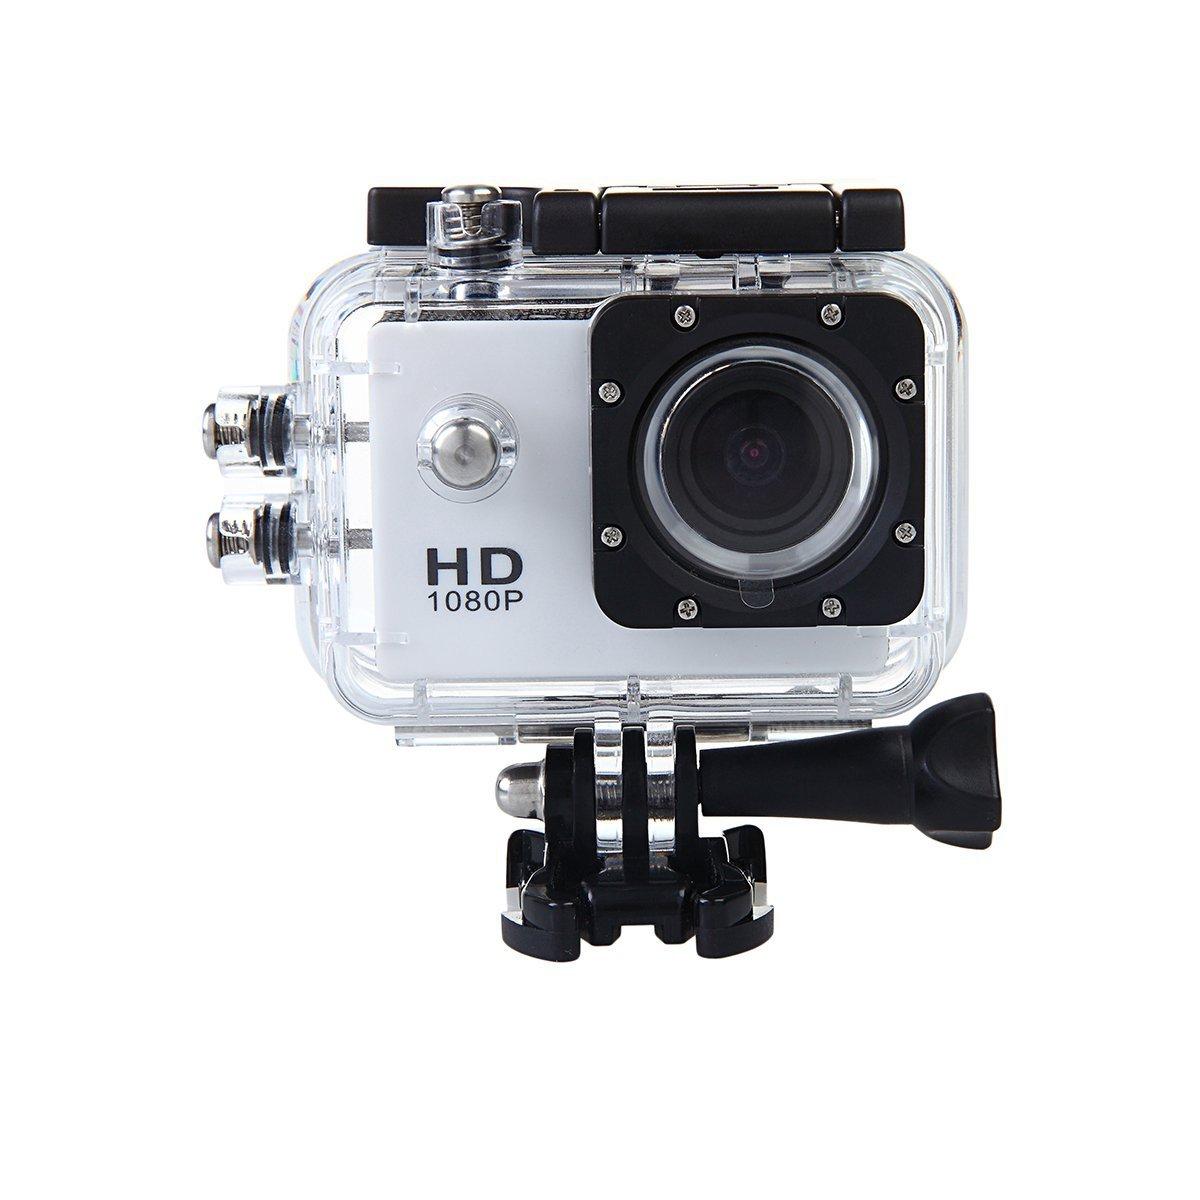 Findway Sport Action Camera Diving Full HD DVR DV SJ4000 Min 30M Waterproof extreme Sport Helmet Action Camera 19201080P G-Senor Motorbike Camcorder DVR DV